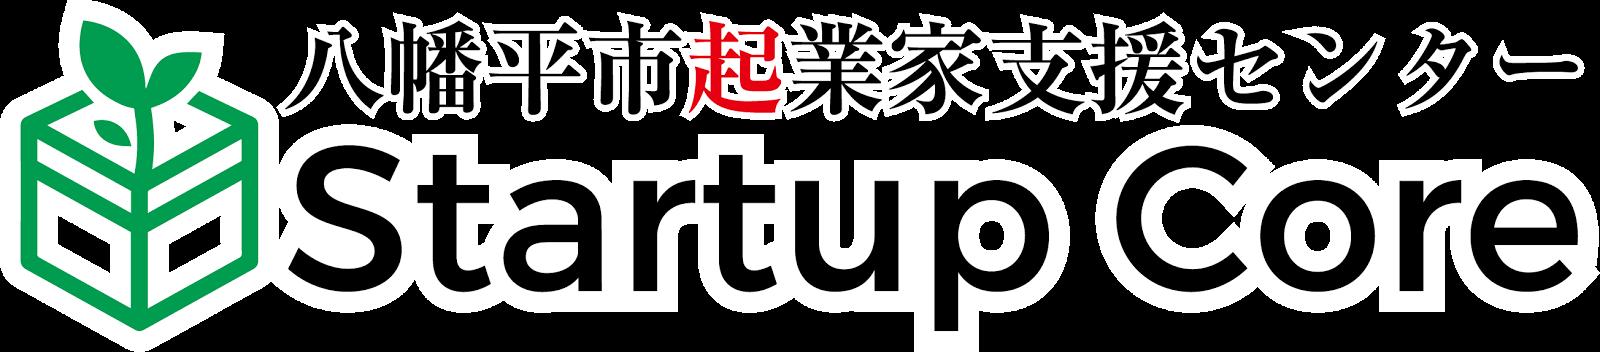 StartupCore